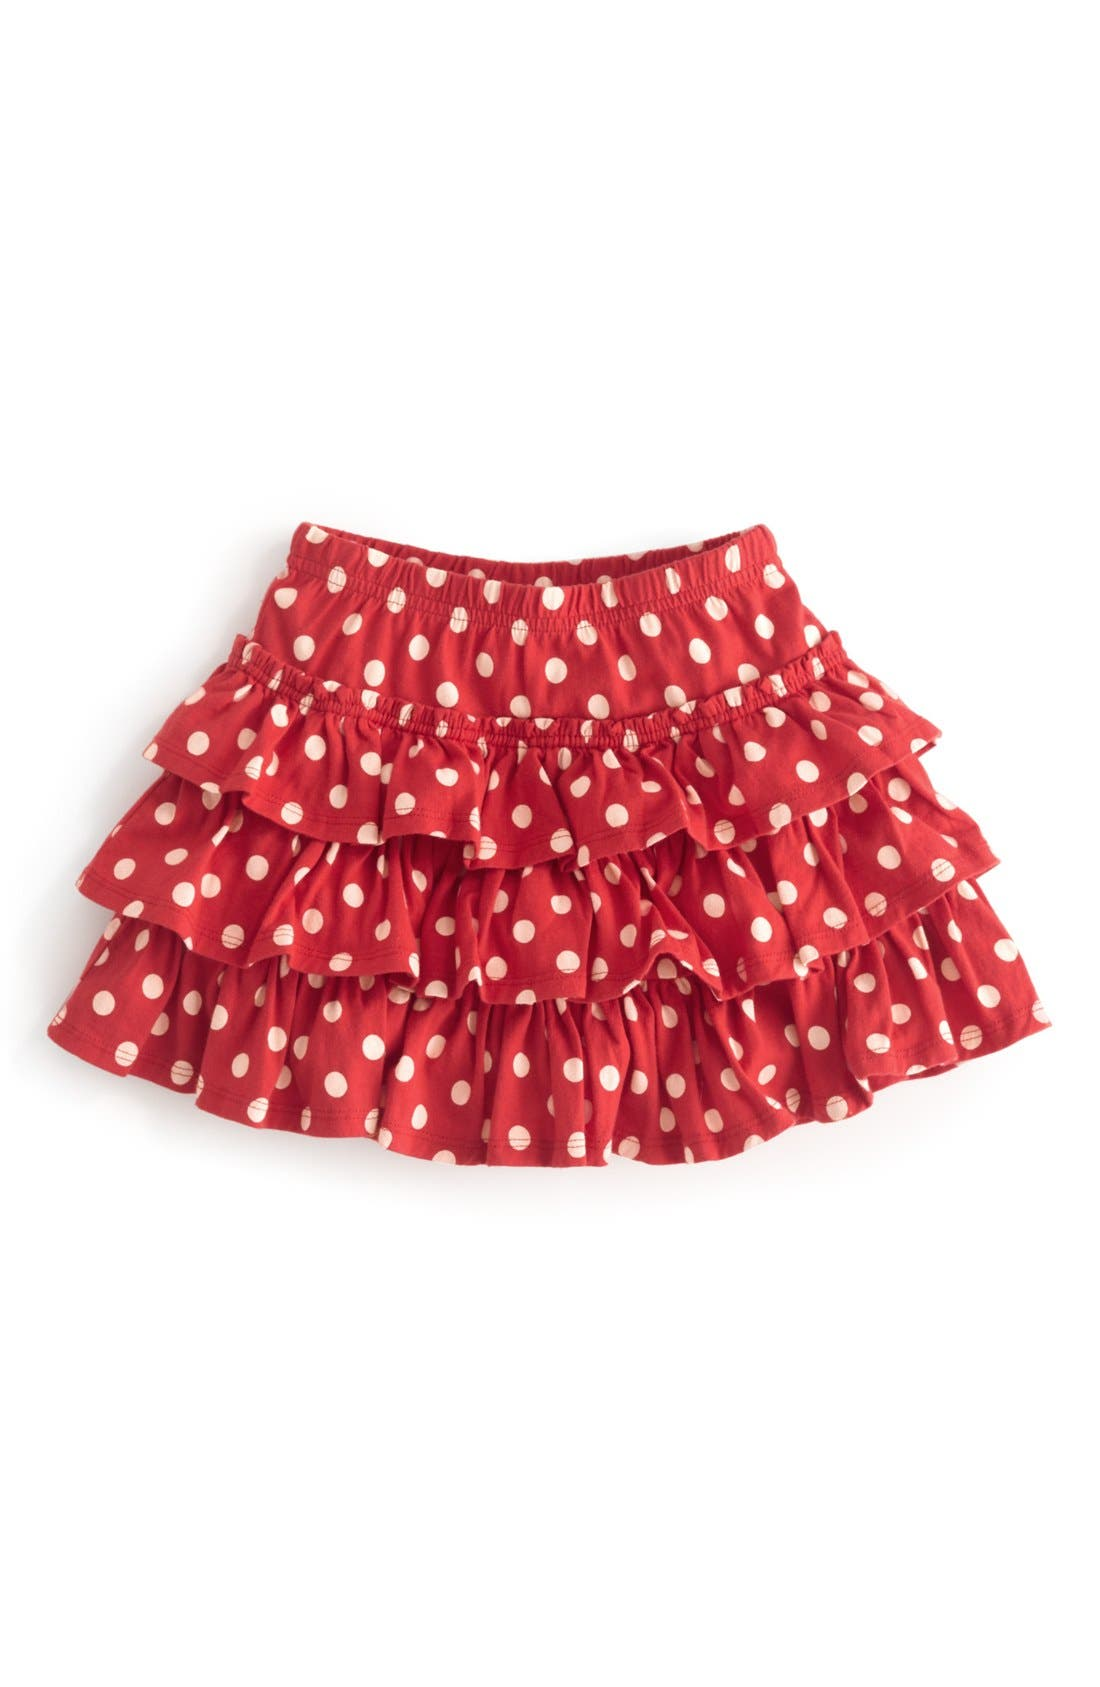 Main Image - Mini Boden 'Spotty' Ruffle Skirt (Little Girls & Big Girls)